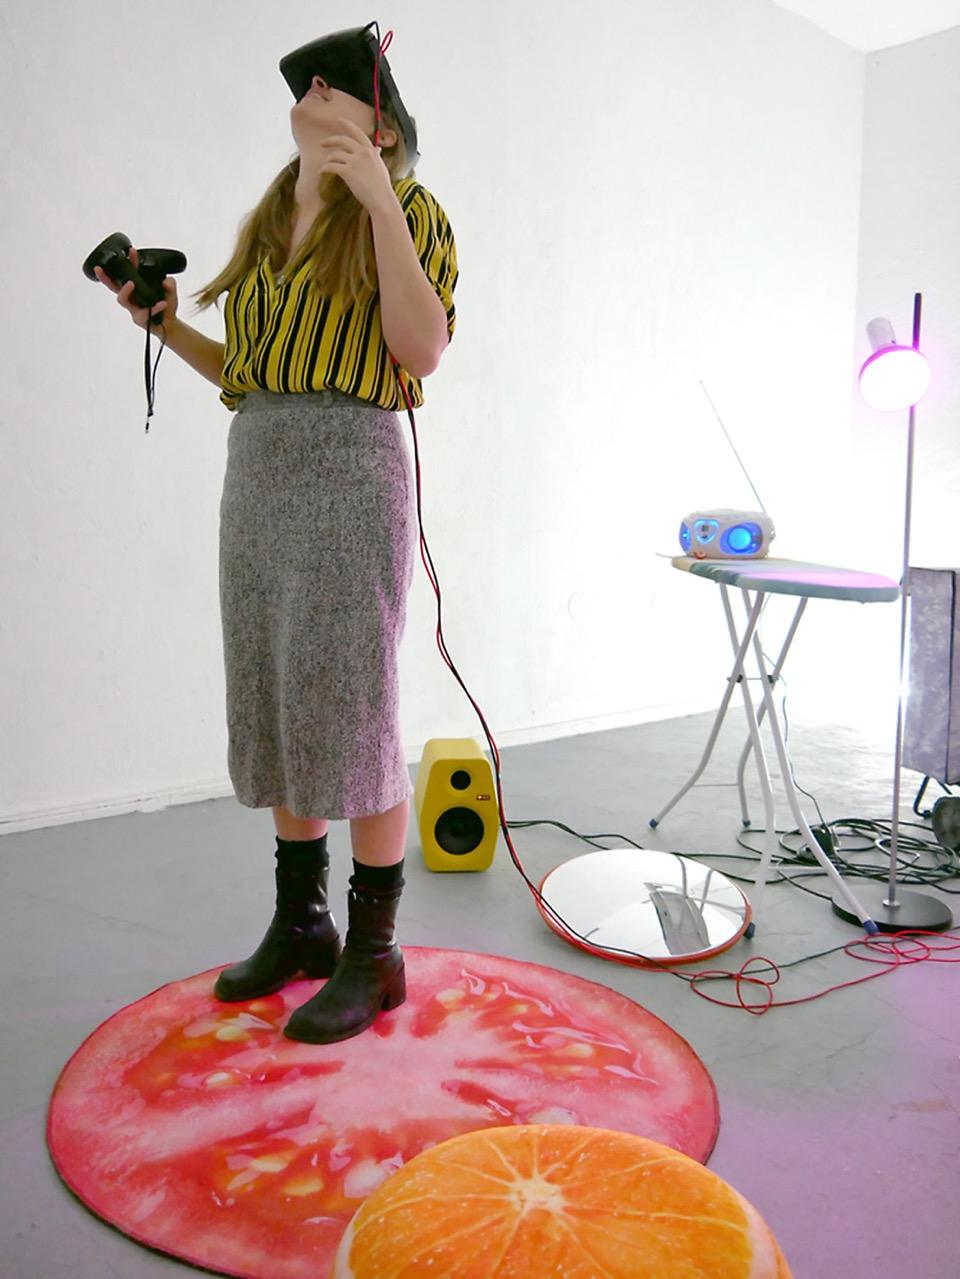 Samuel Perea Diaz: 'The wonderful everyVRday is coming' Sound Installation/Virtual Reality 28.02.2020 - 01.03.2020 - SoundsAbout@Zwitschermaschine © Victor Yrigoyen